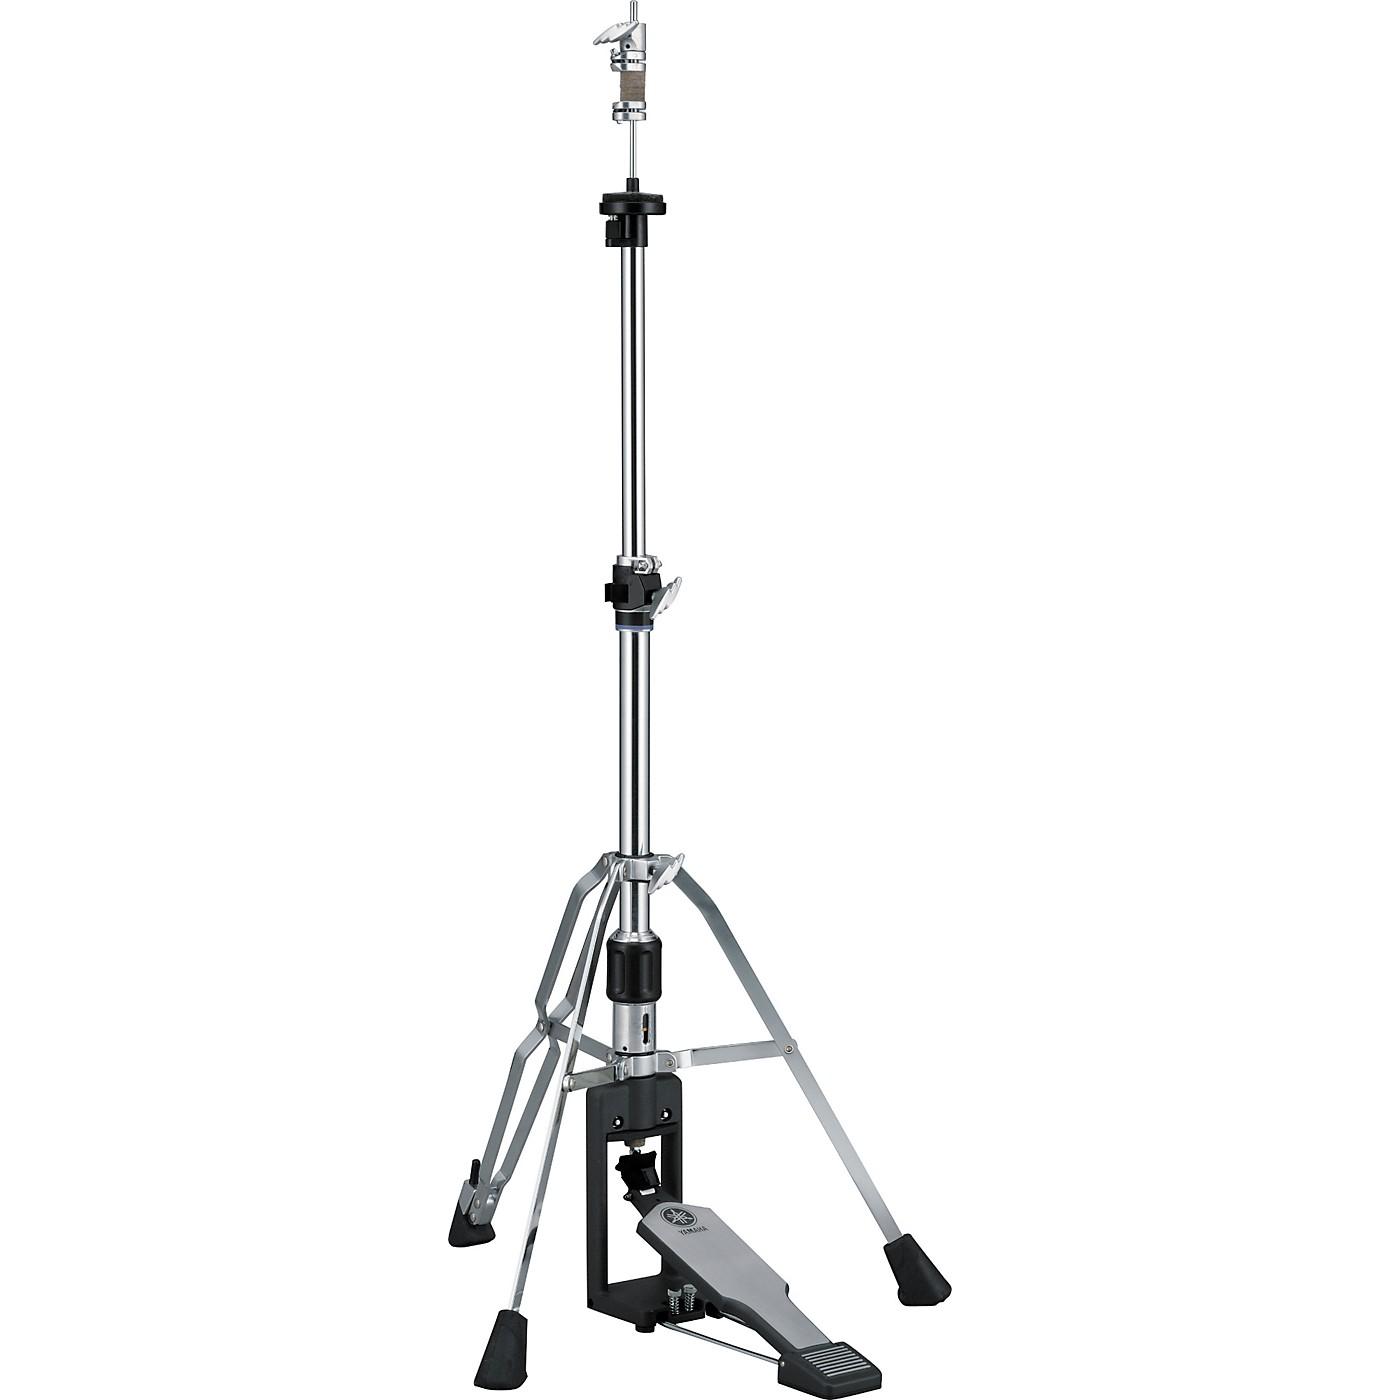 Yamaha 3-leg Hi-Hat Cymbal Stand thumbnail